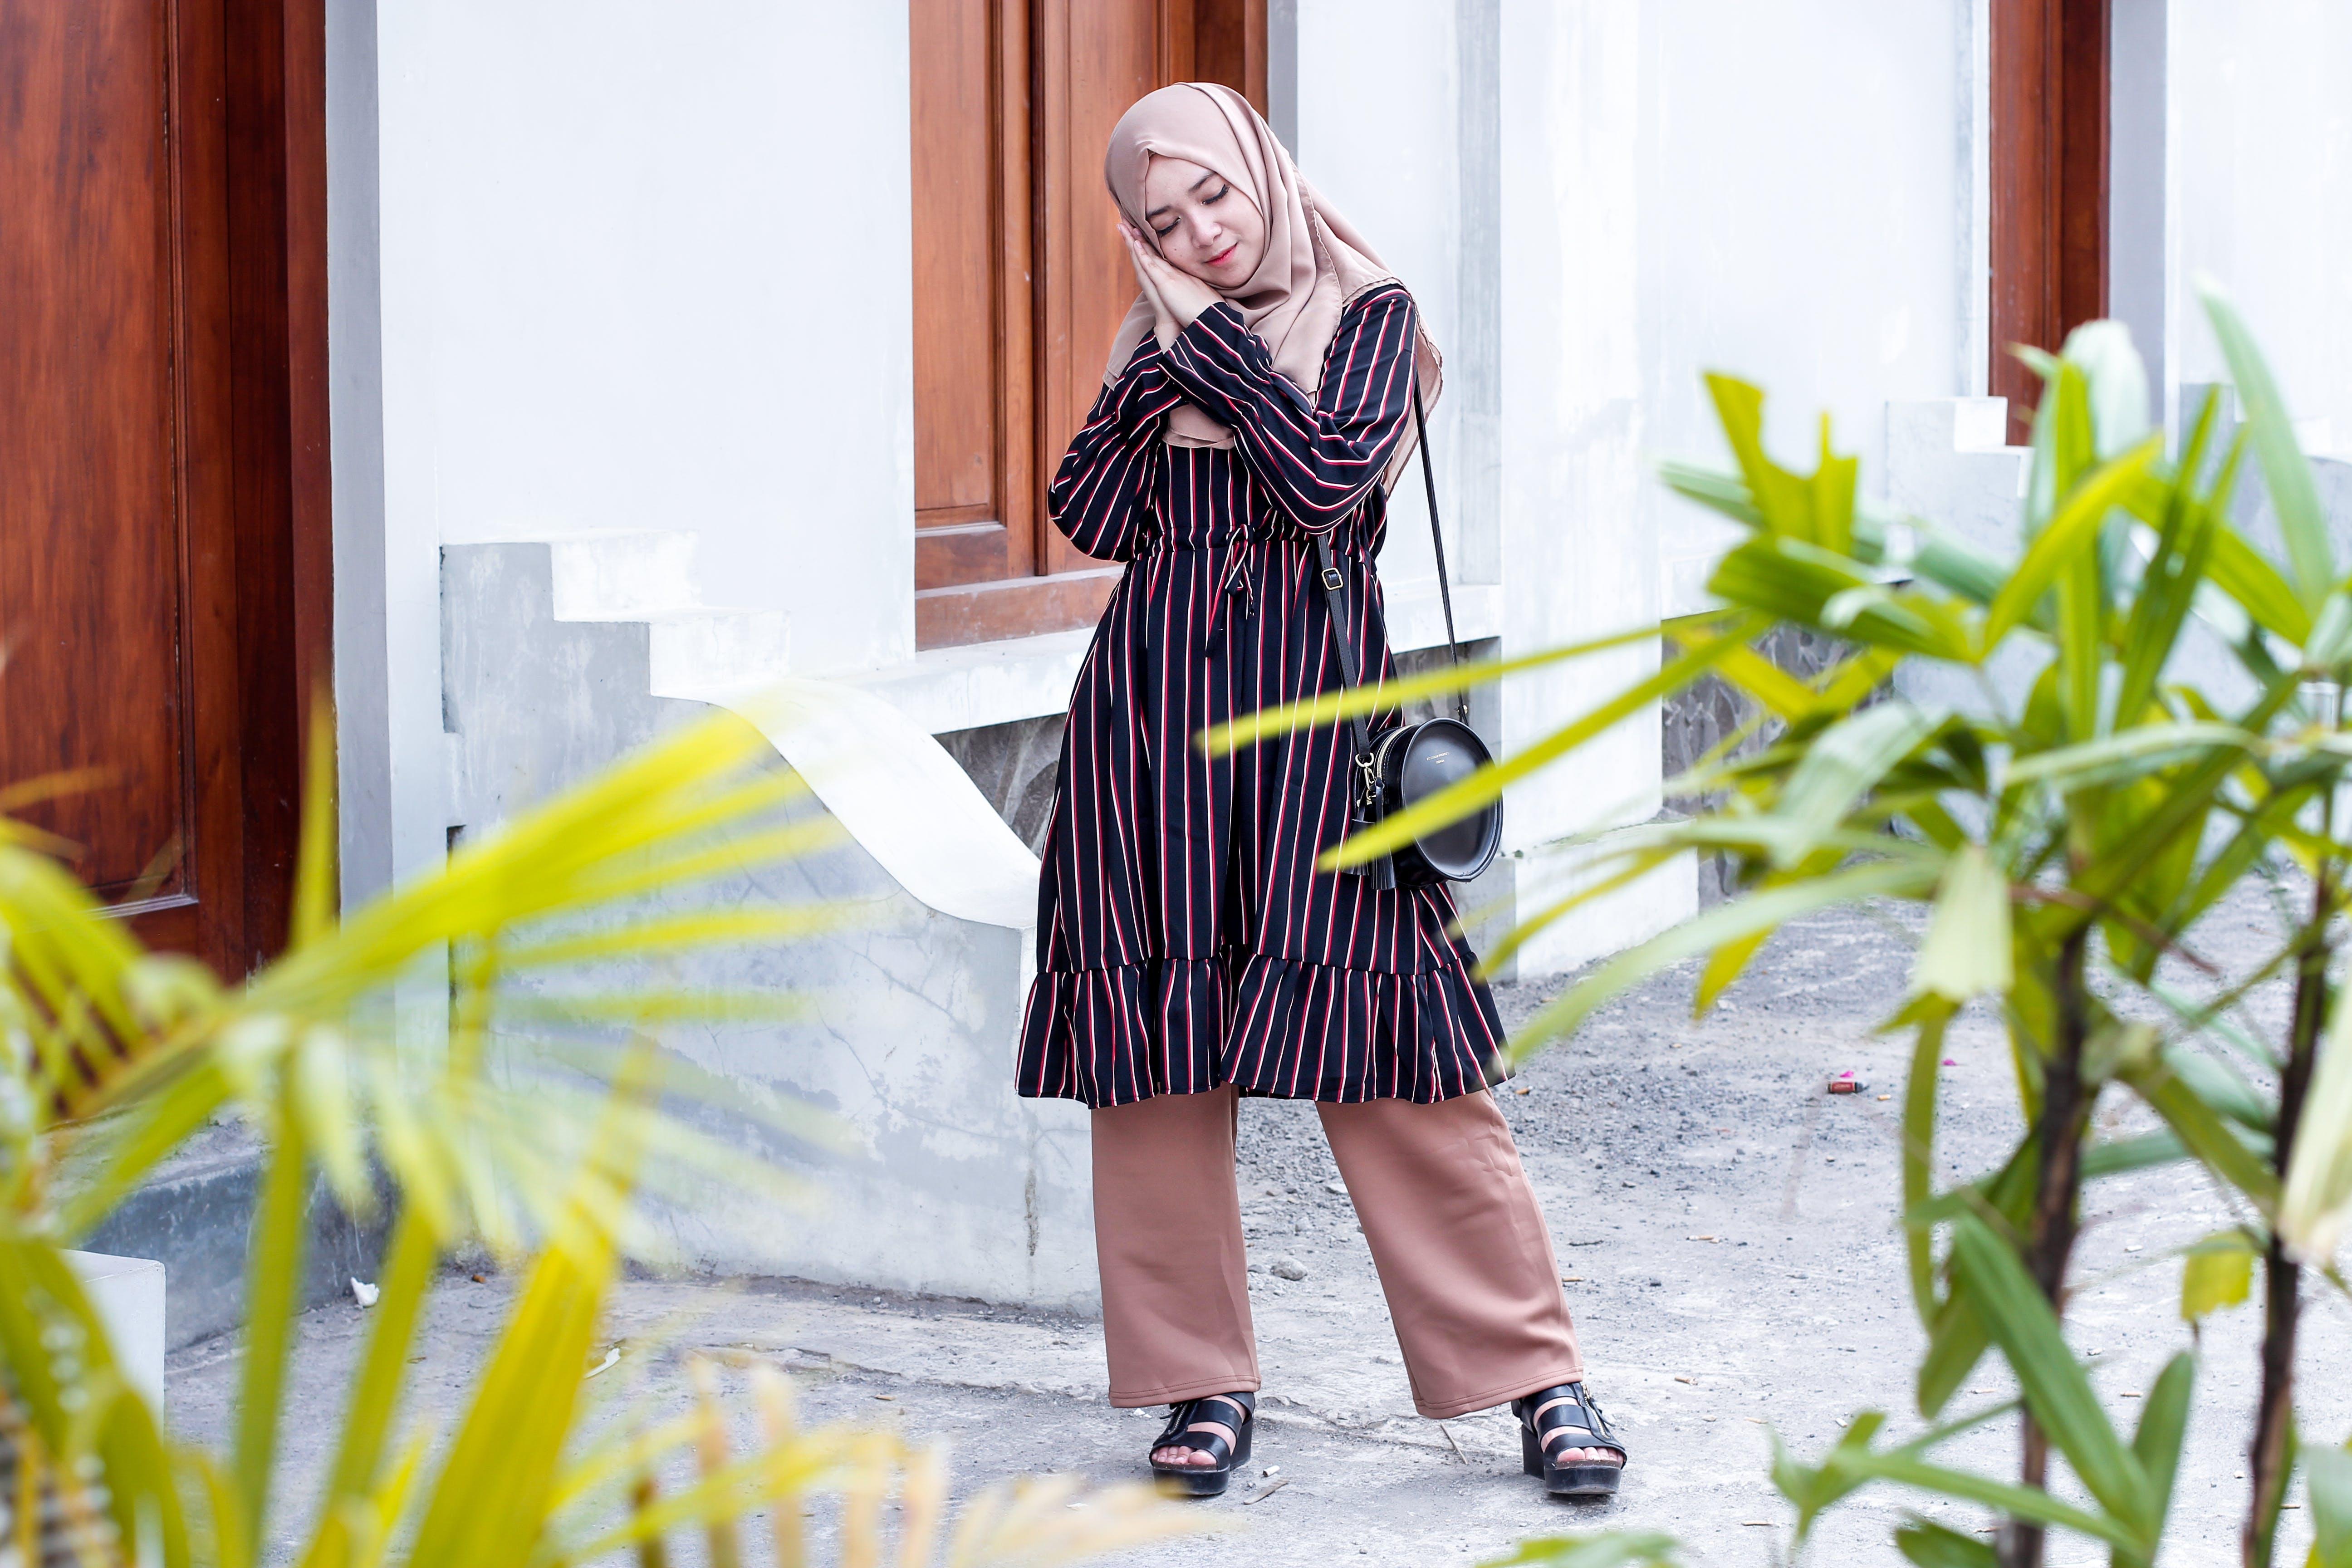 Woman Wearing Abaya Dress and Standing on Ground